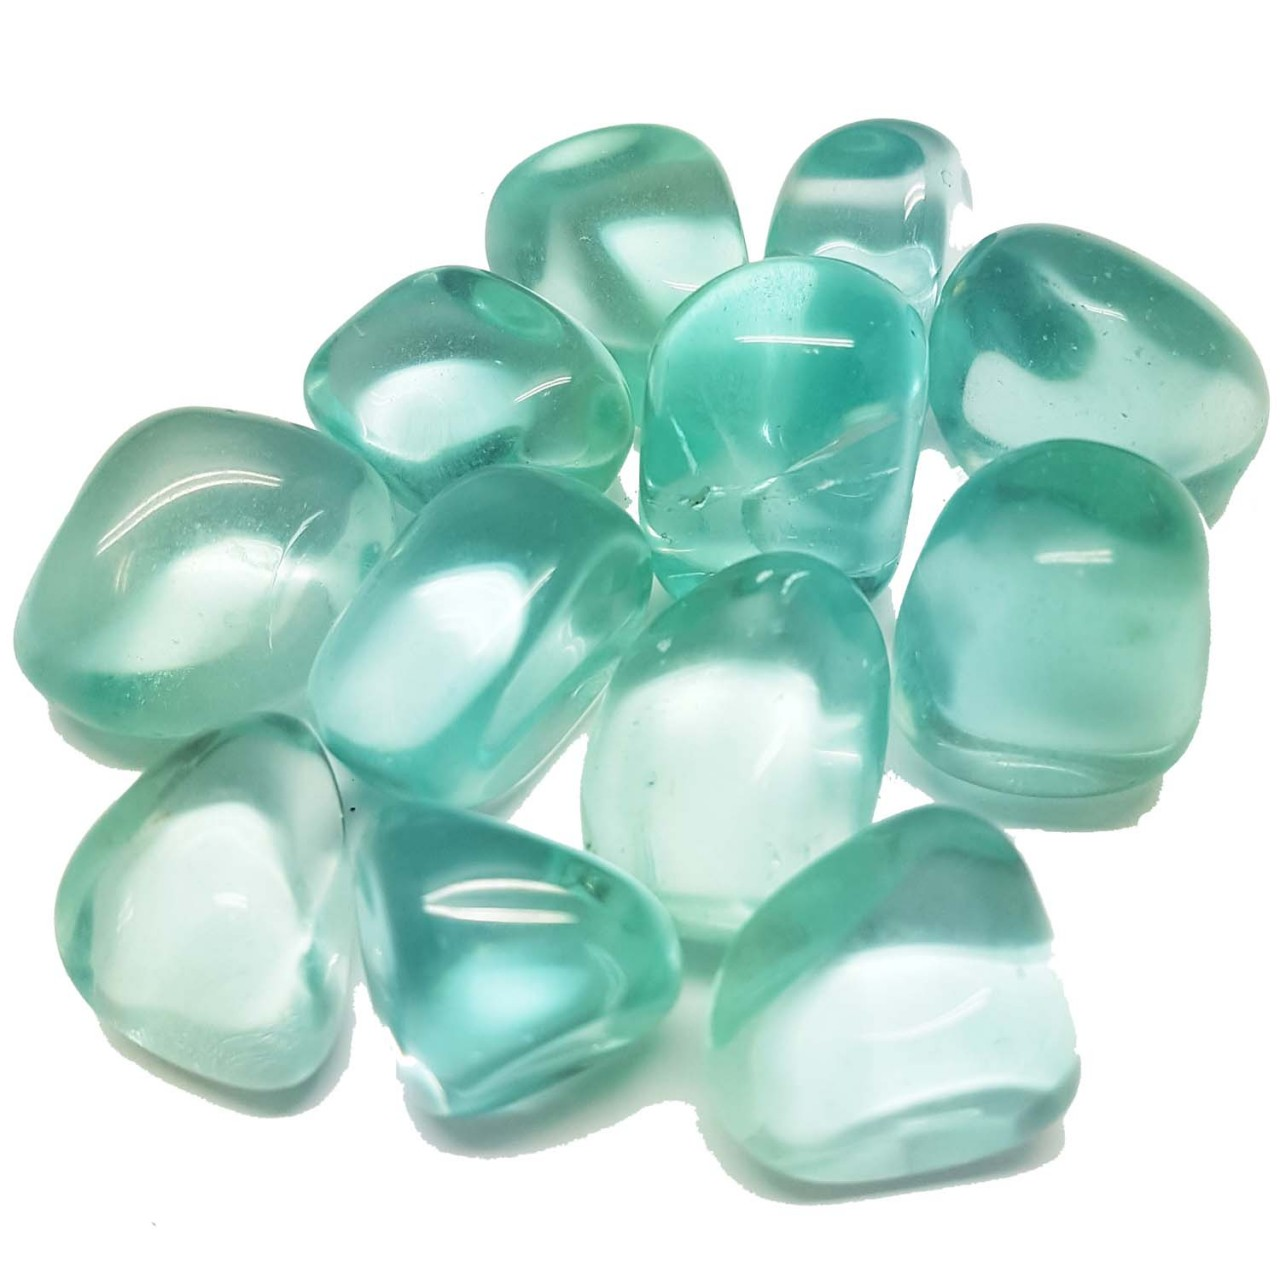 Tumbled Stones - BLUE OBSIDIAN